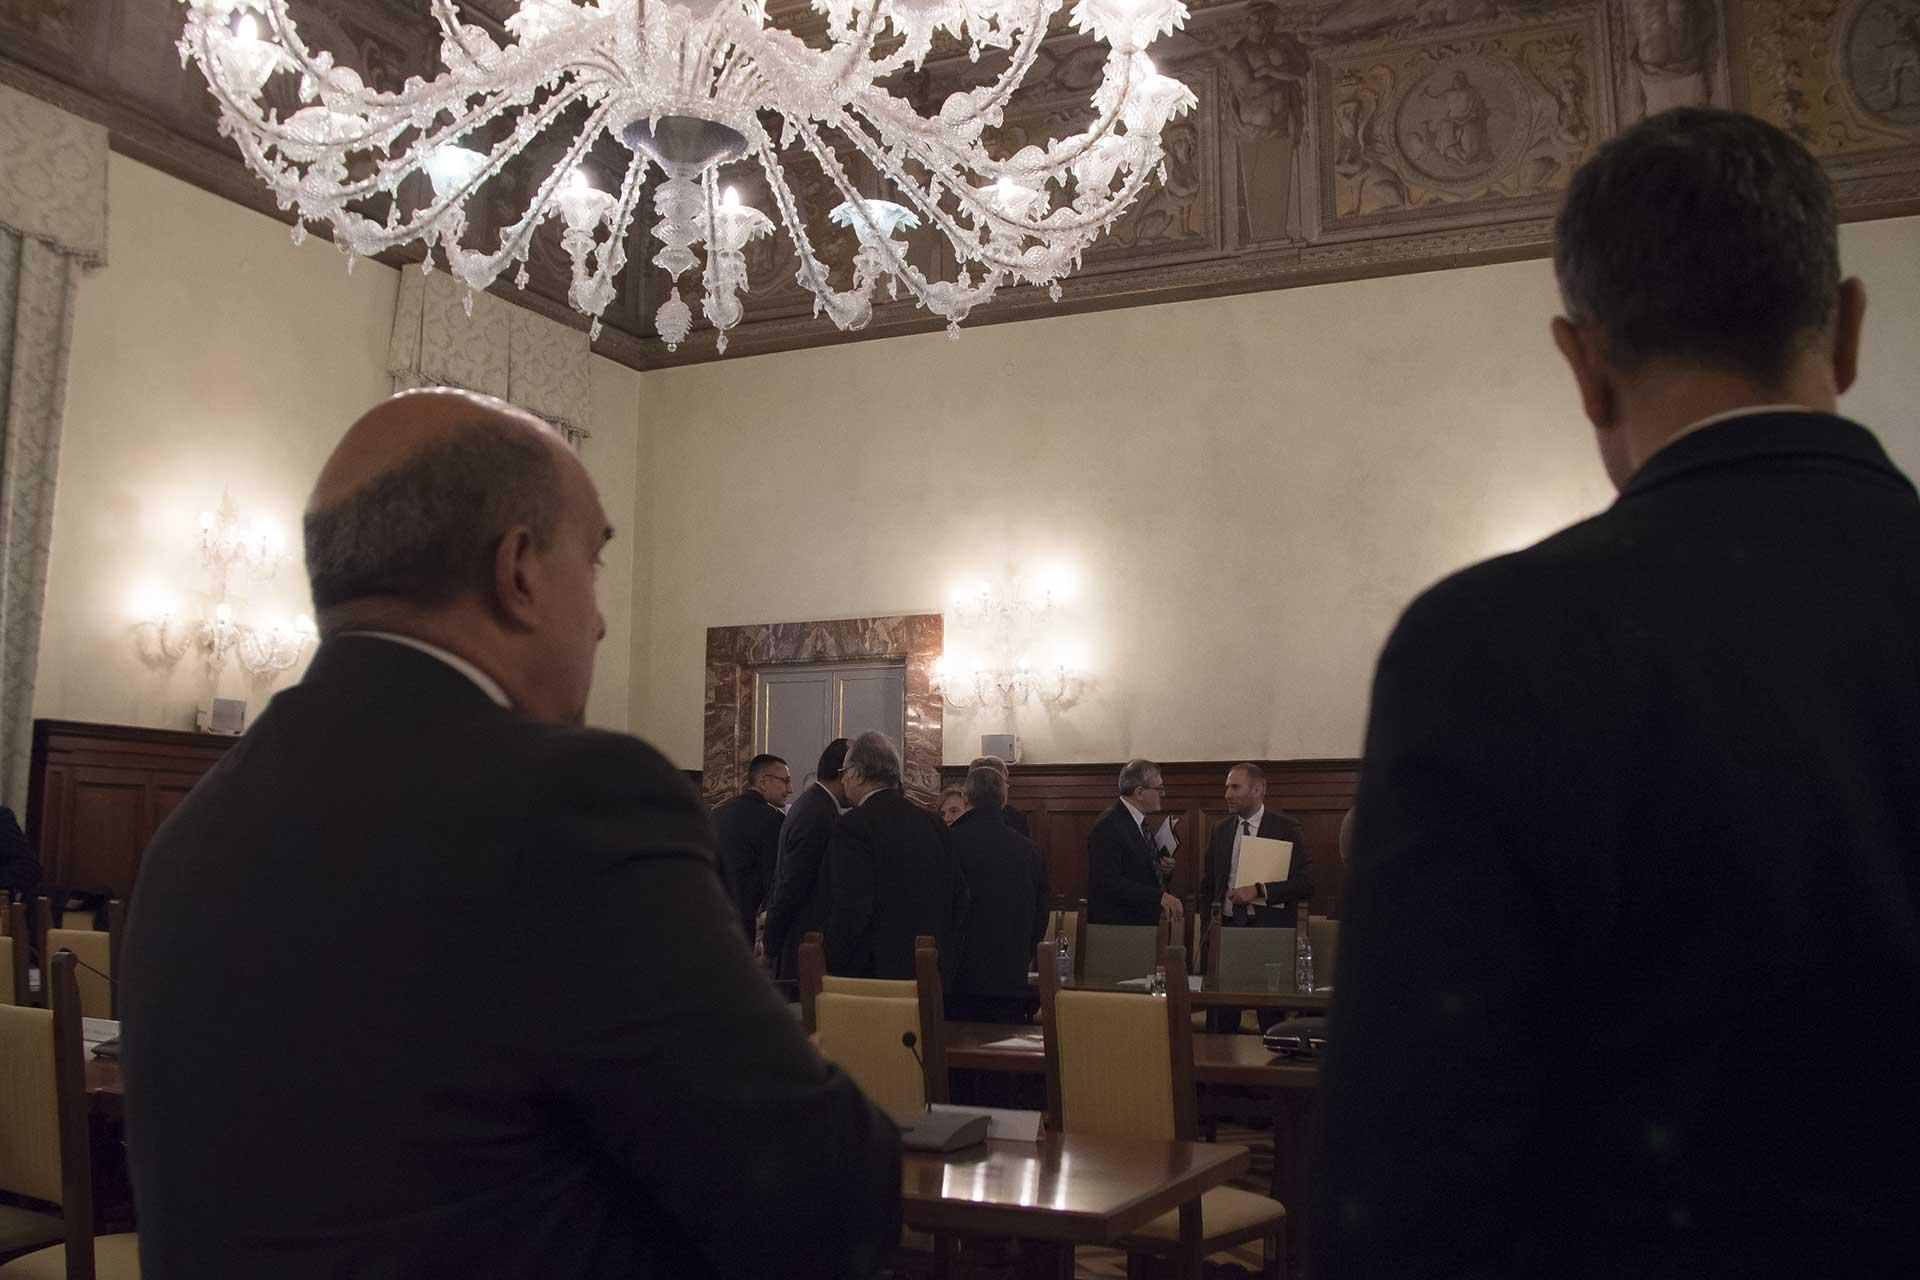 UIL Polizia Oronzo Cosi Silvio Riccardi